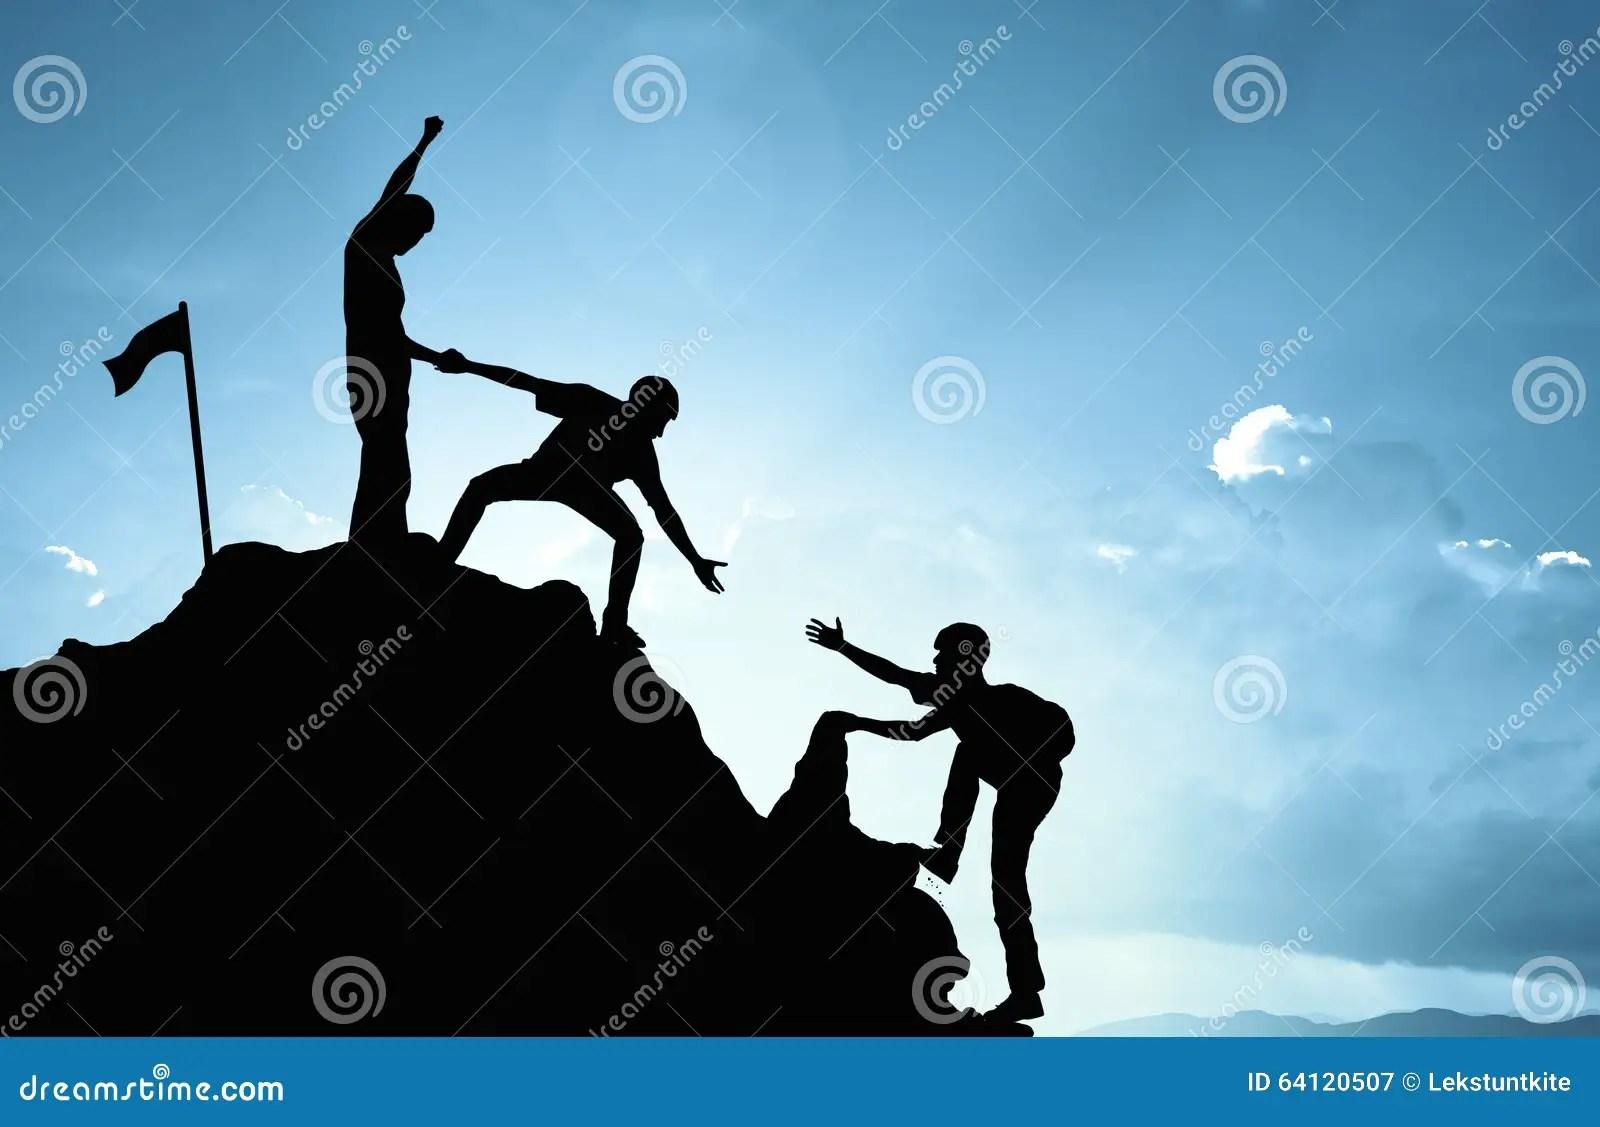 Climbing Helping Team Work Success Concept Stock Image